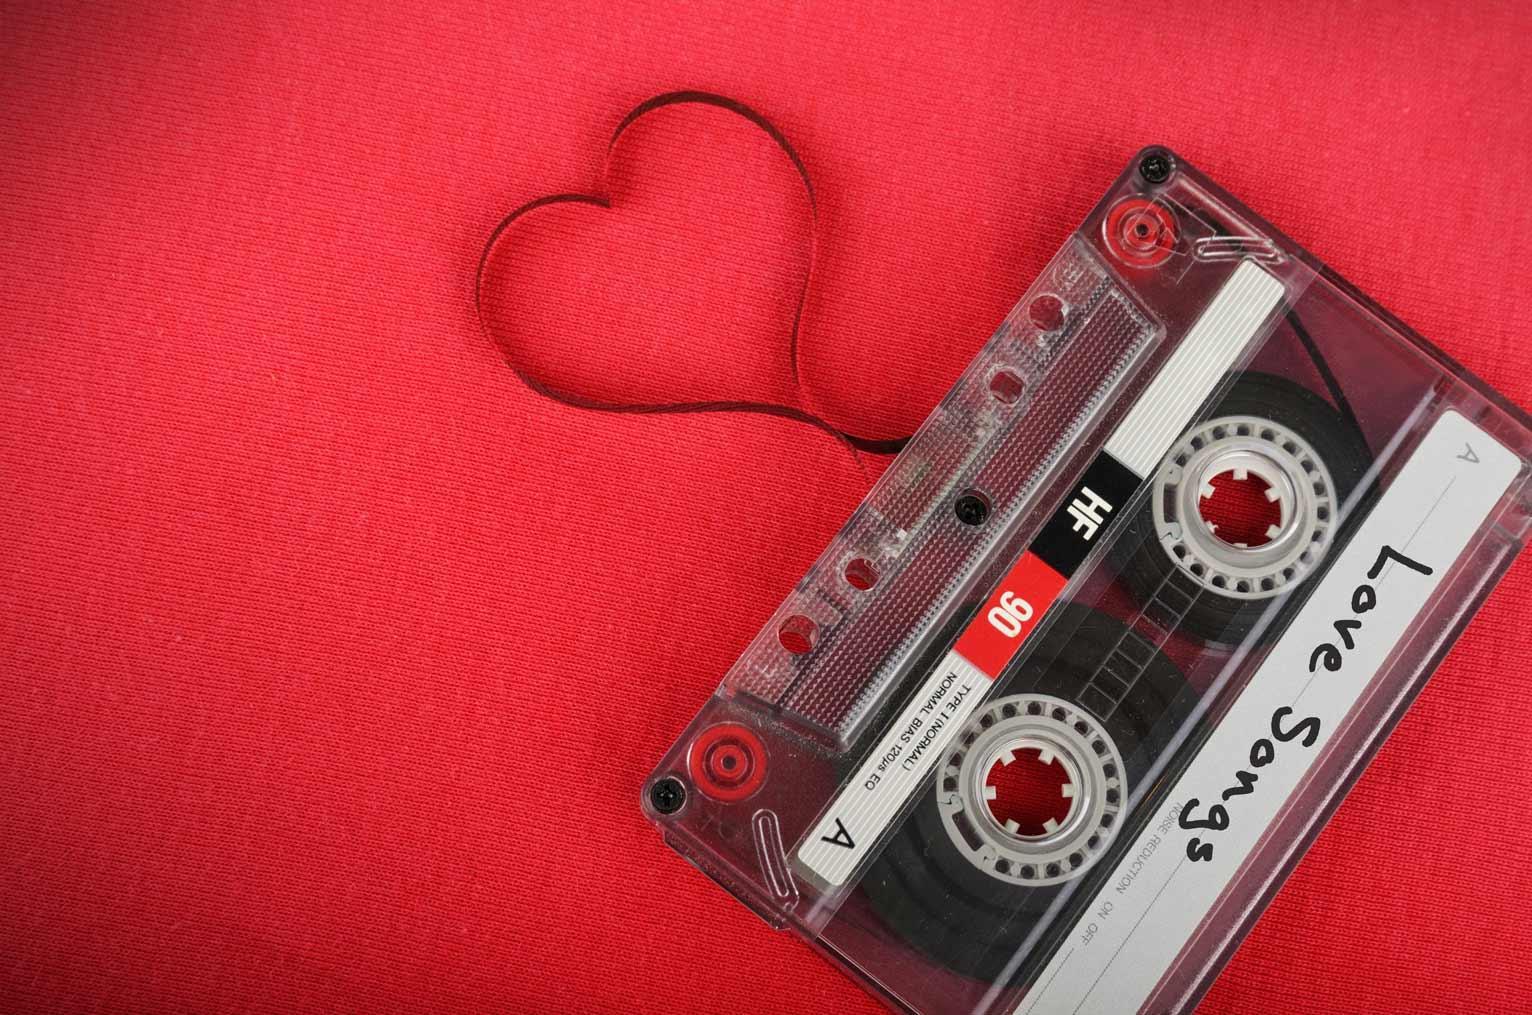 D:\Работа\SEO\GUEST POSTS\POSTS 2019\28.08.2019\Uyo Top_10_Best_Love_Songs_For_Wedding\shutterstock_175716383.jpg